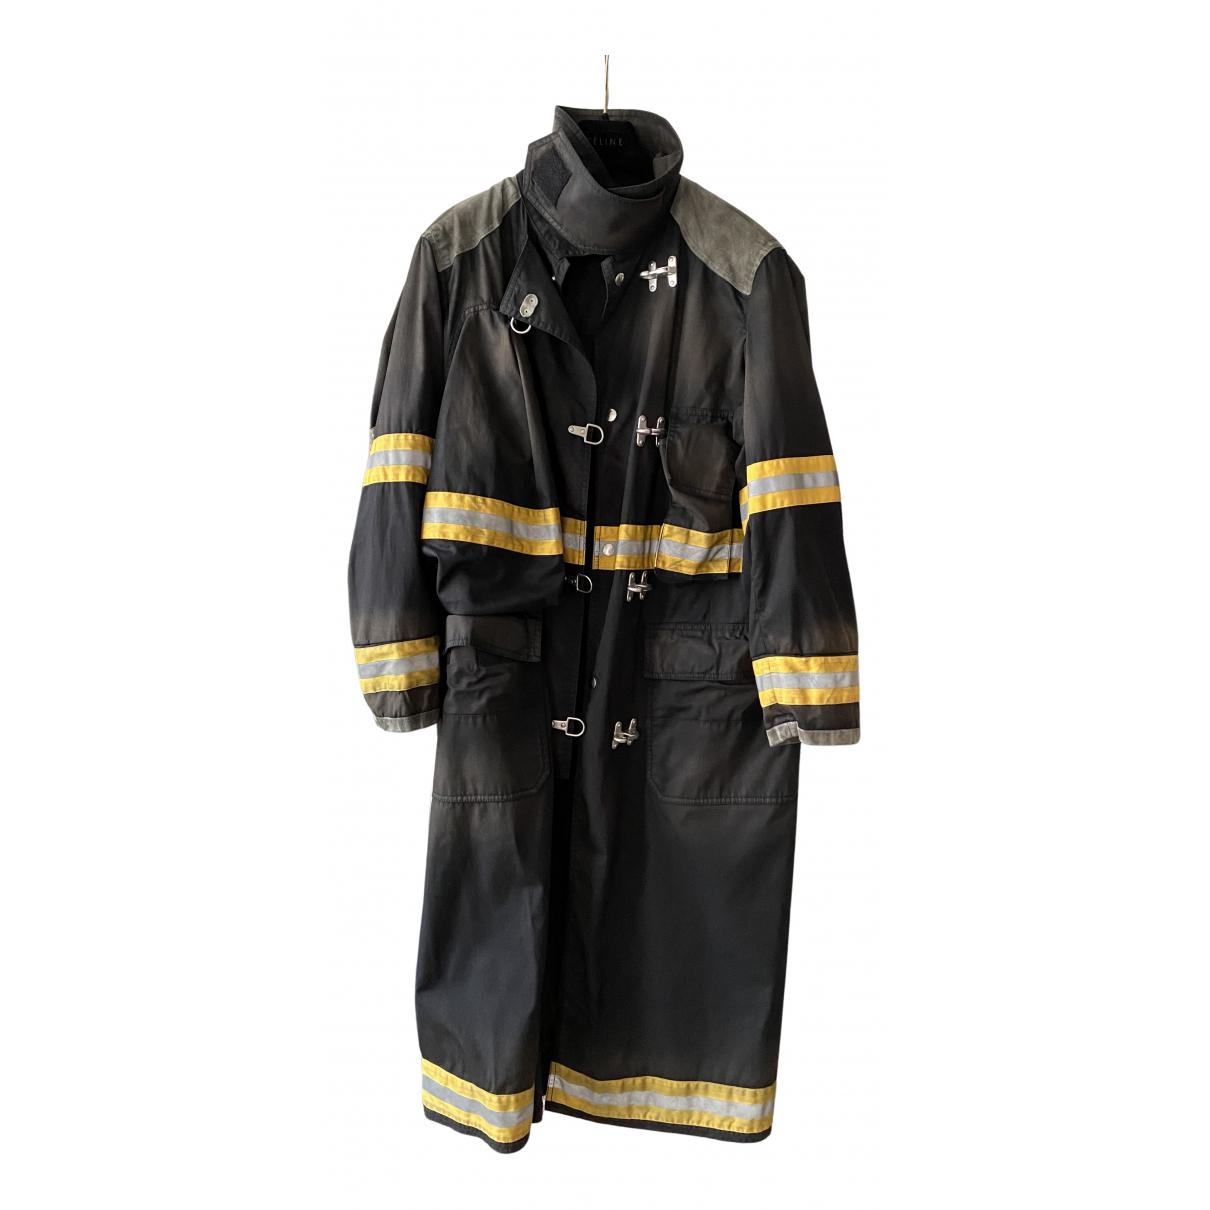 Calvin Klein 205w39nyc N Black Cotton Coat for Men